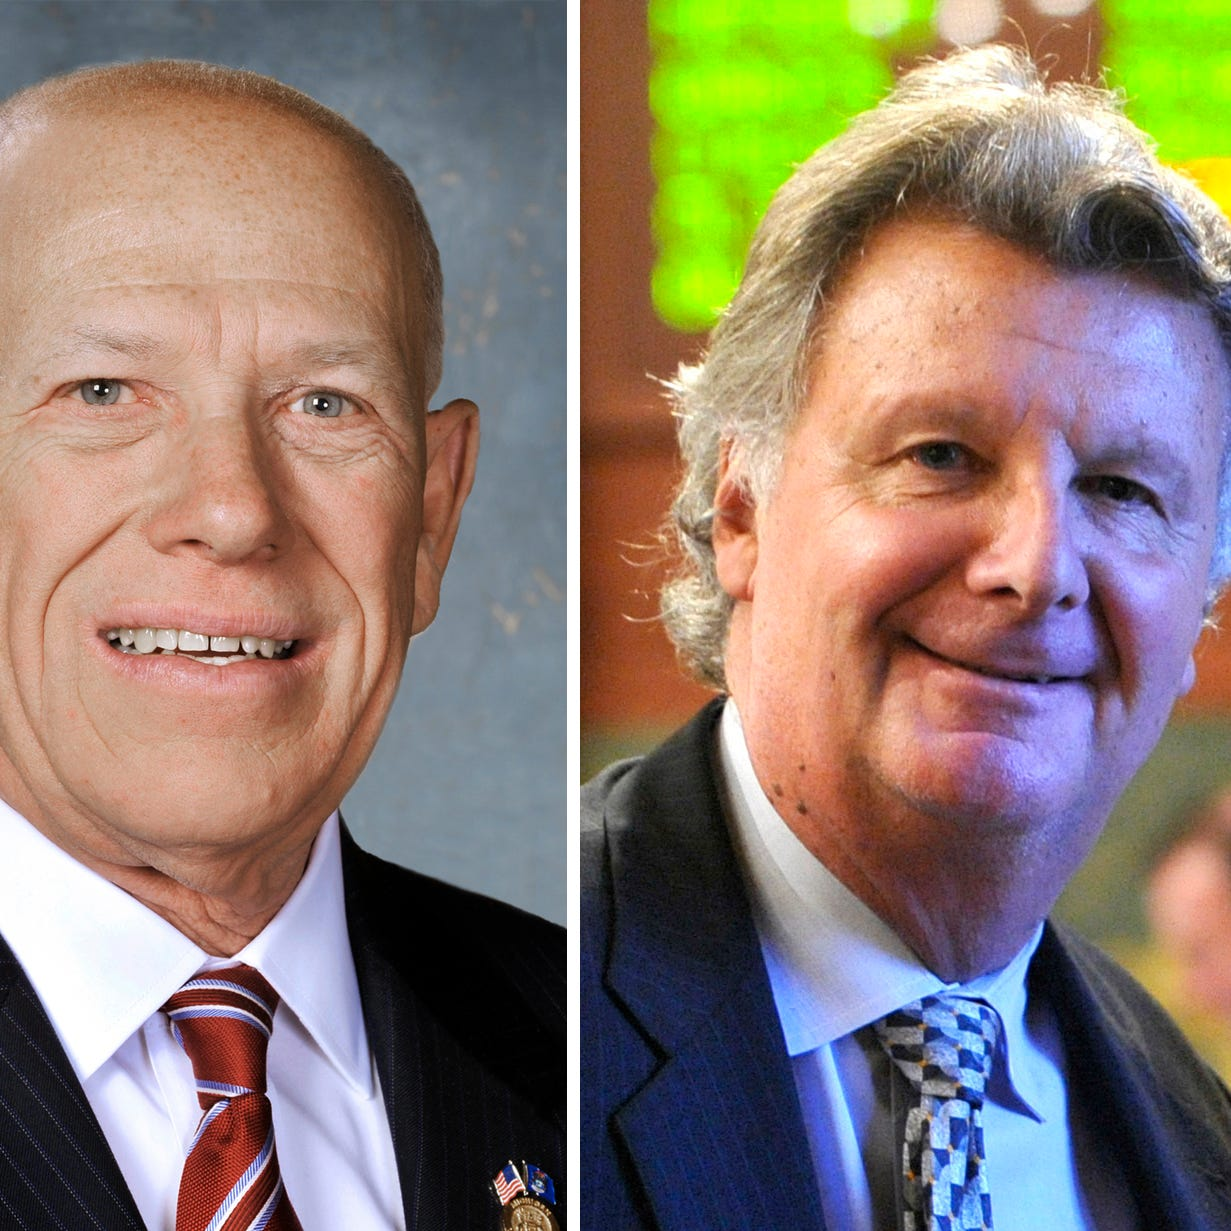 Bill could provide a potential $92K windfall for 2 Michigan senators